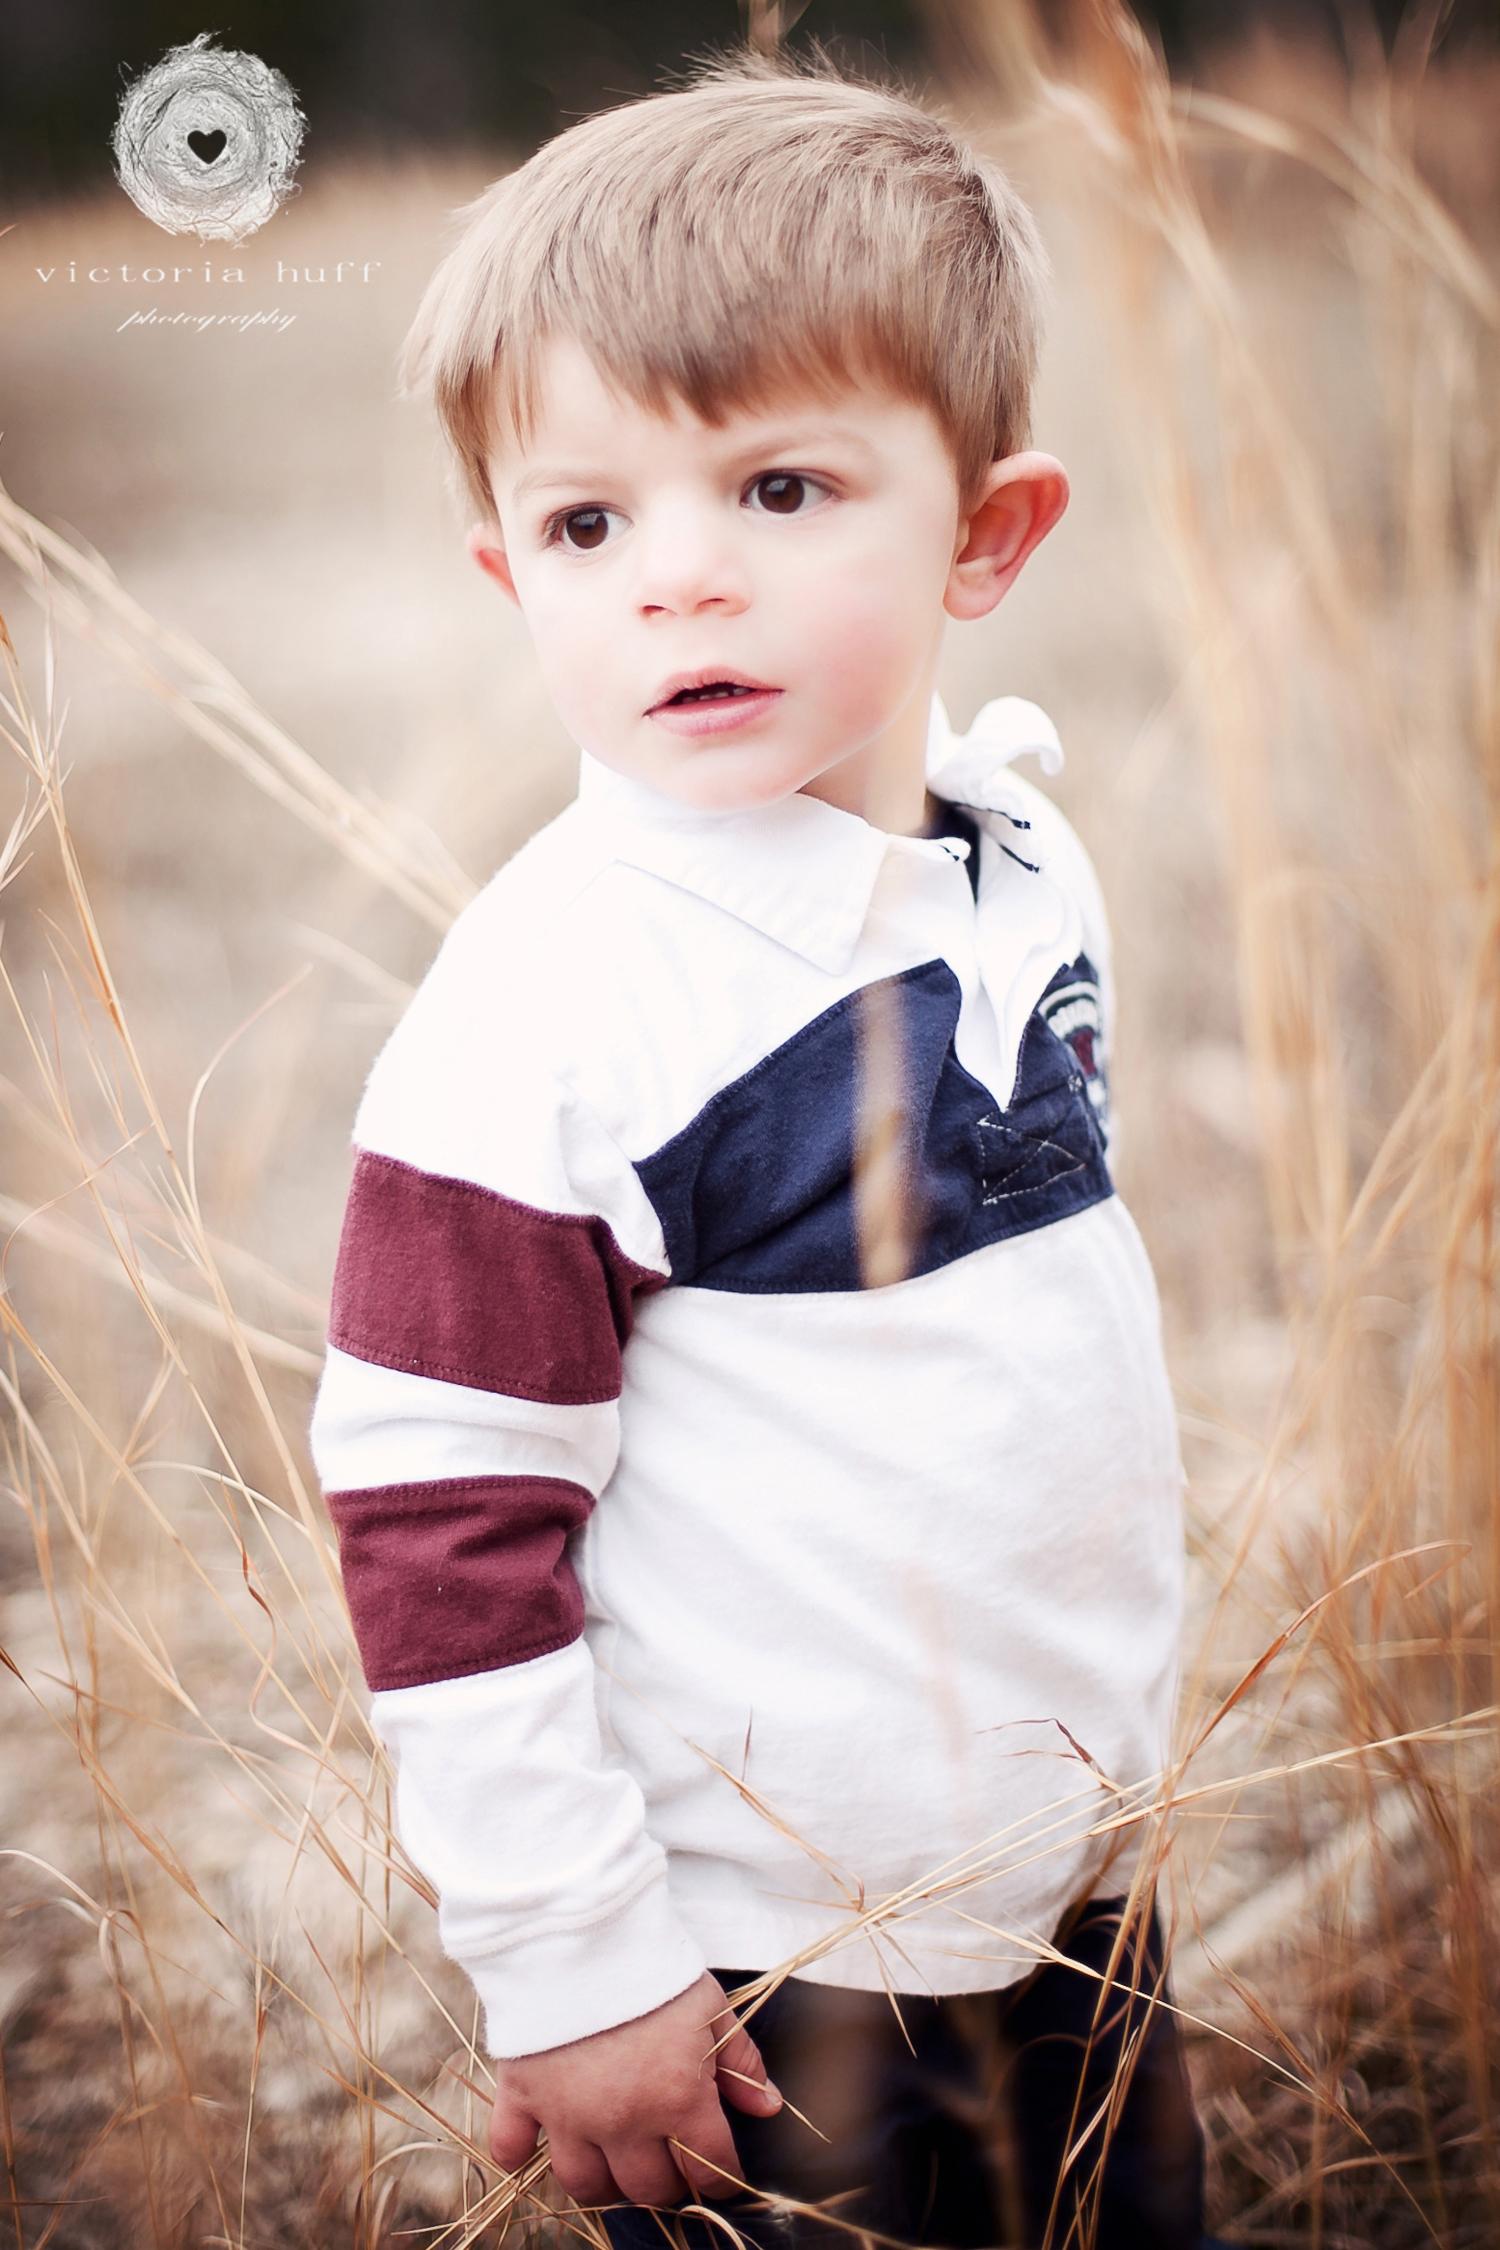 McCarty-Boys-Family-Children-Photography-Athens-Georgia-Nashville-Tennessee-107w.jpg